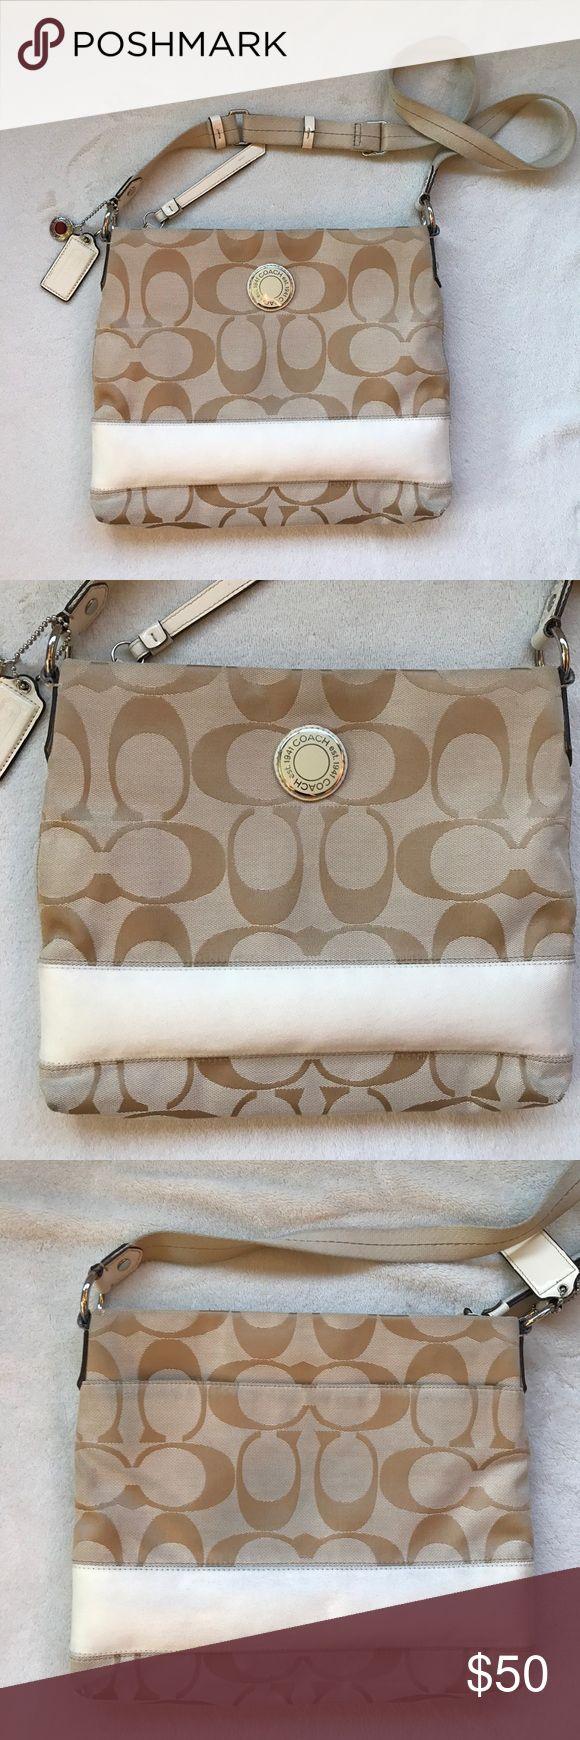 5263ed4388 ... low price authentic coach coach purse coach bags and size 10 coach  canvas crossbody c7395 d4819